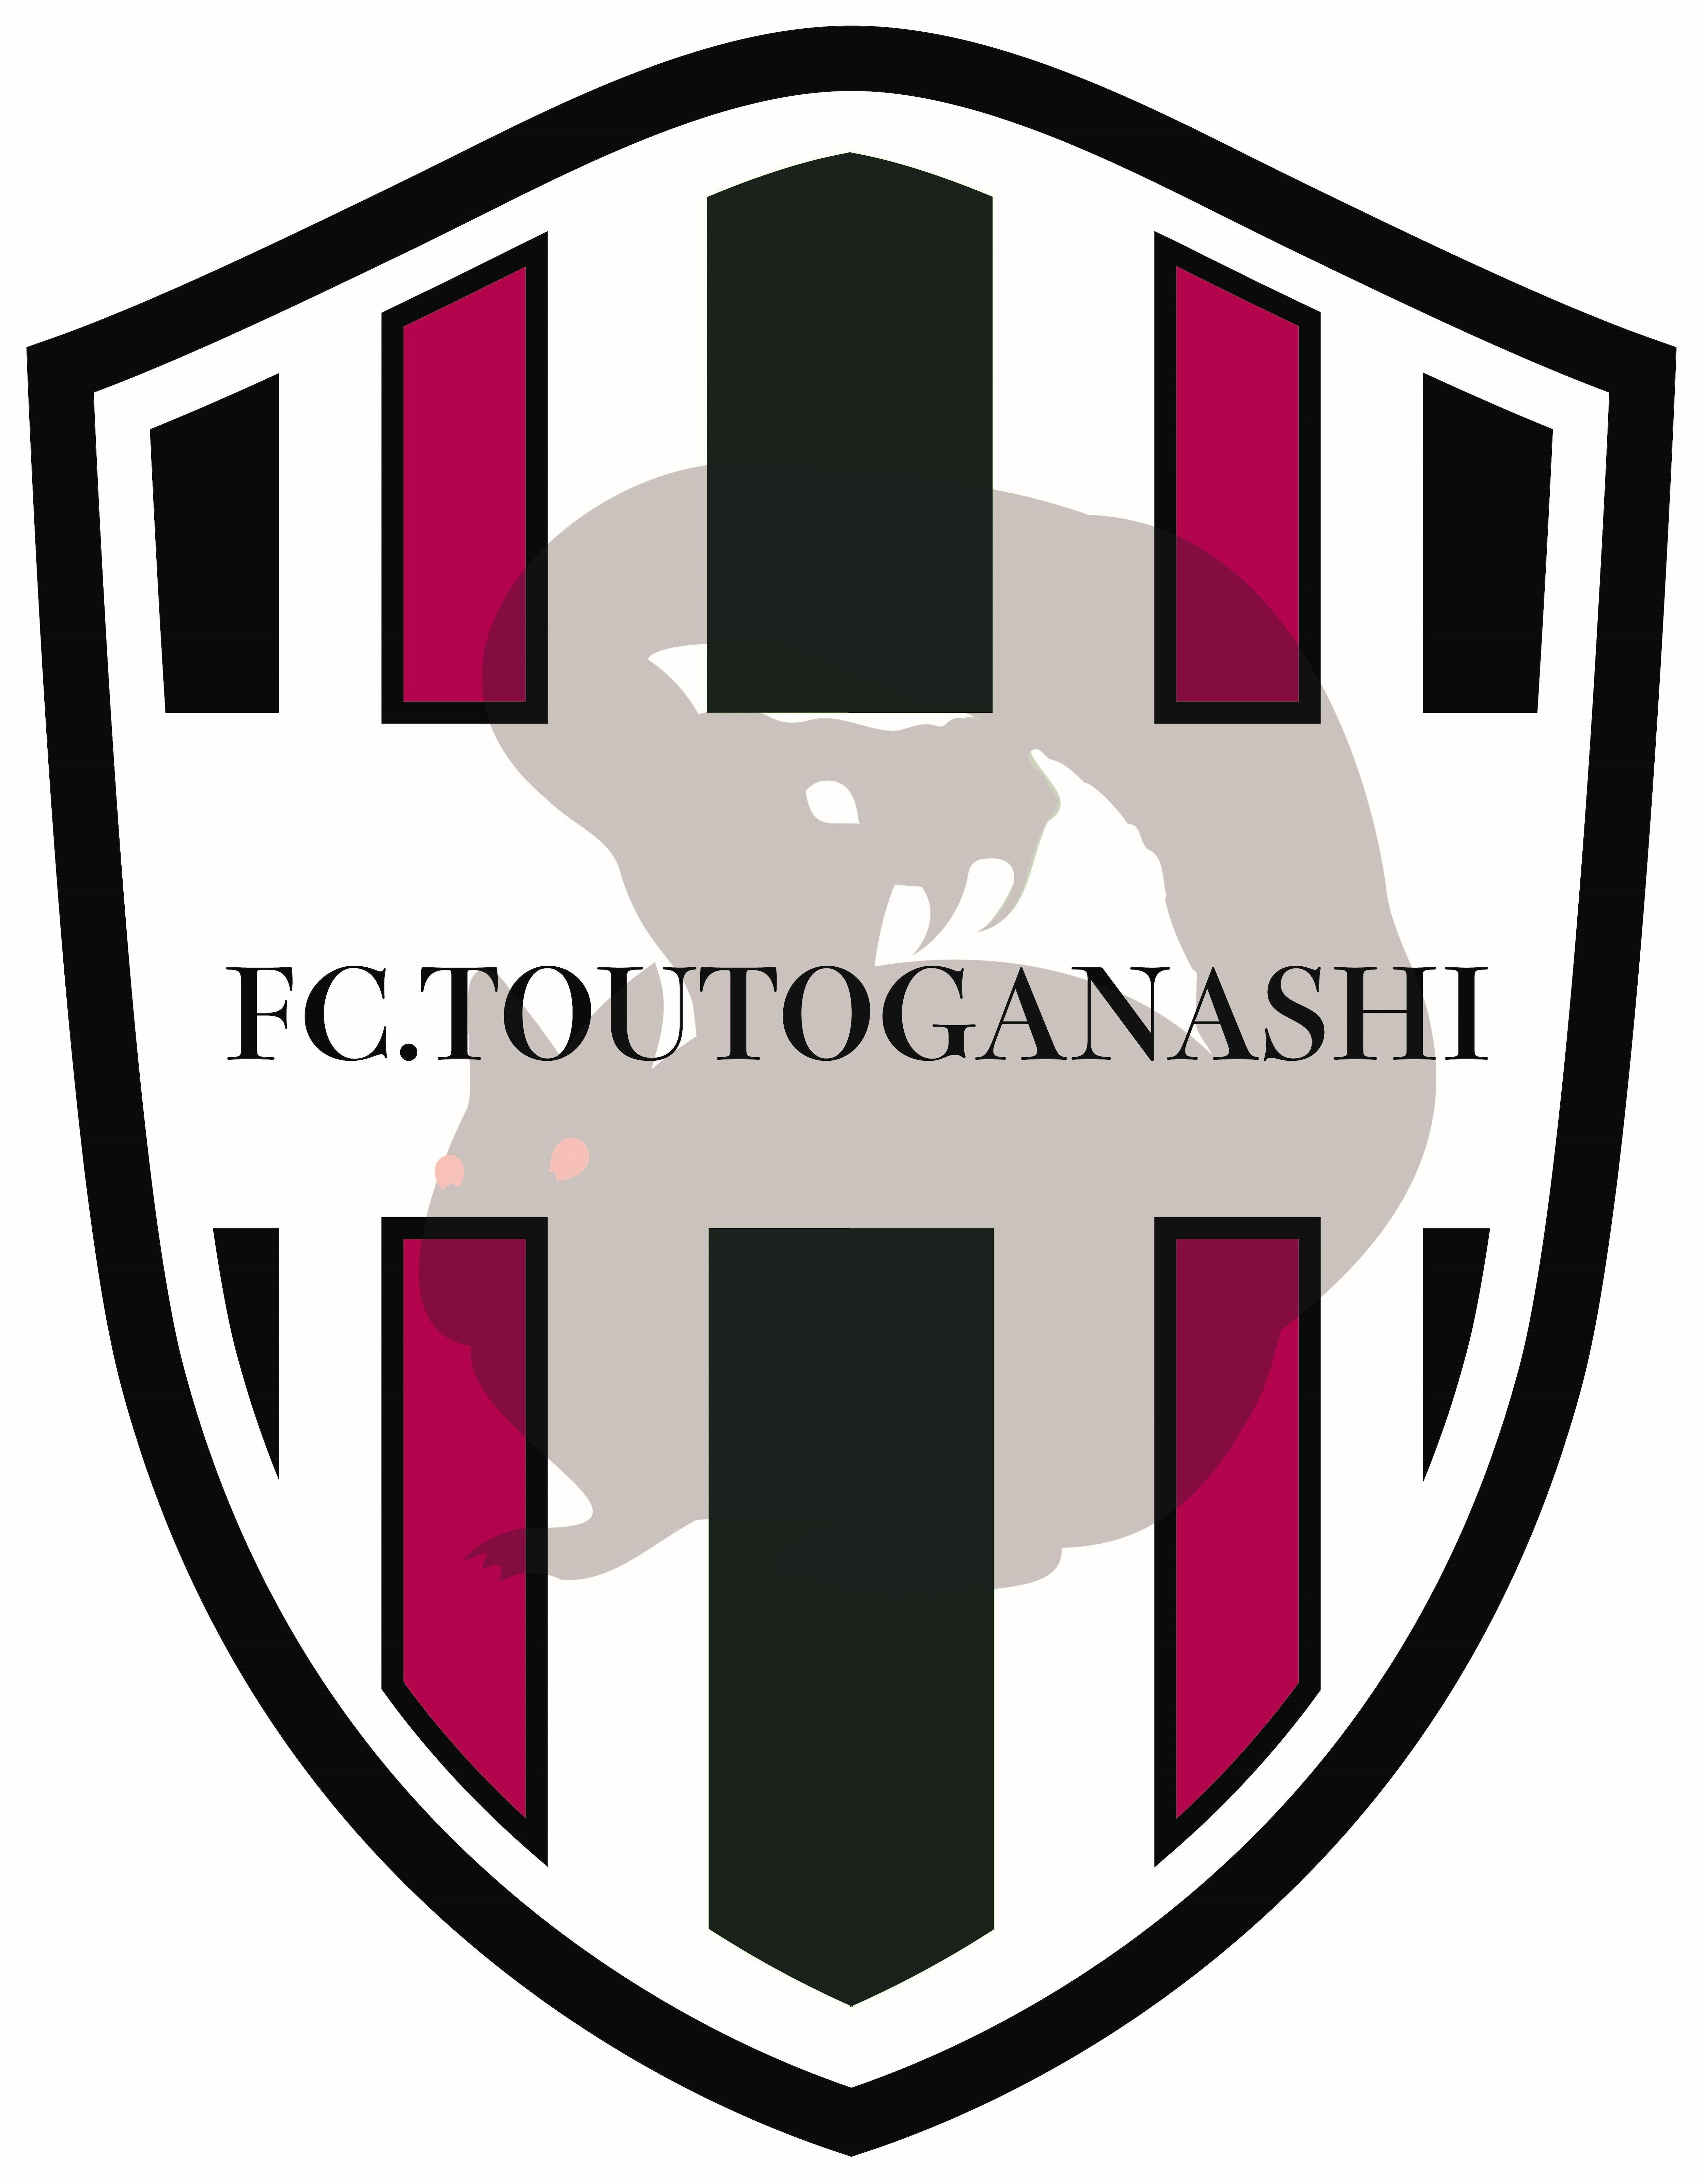 TOUTOGANASHI|2021リーグ年間選手スタッフ登録費のイメージその1